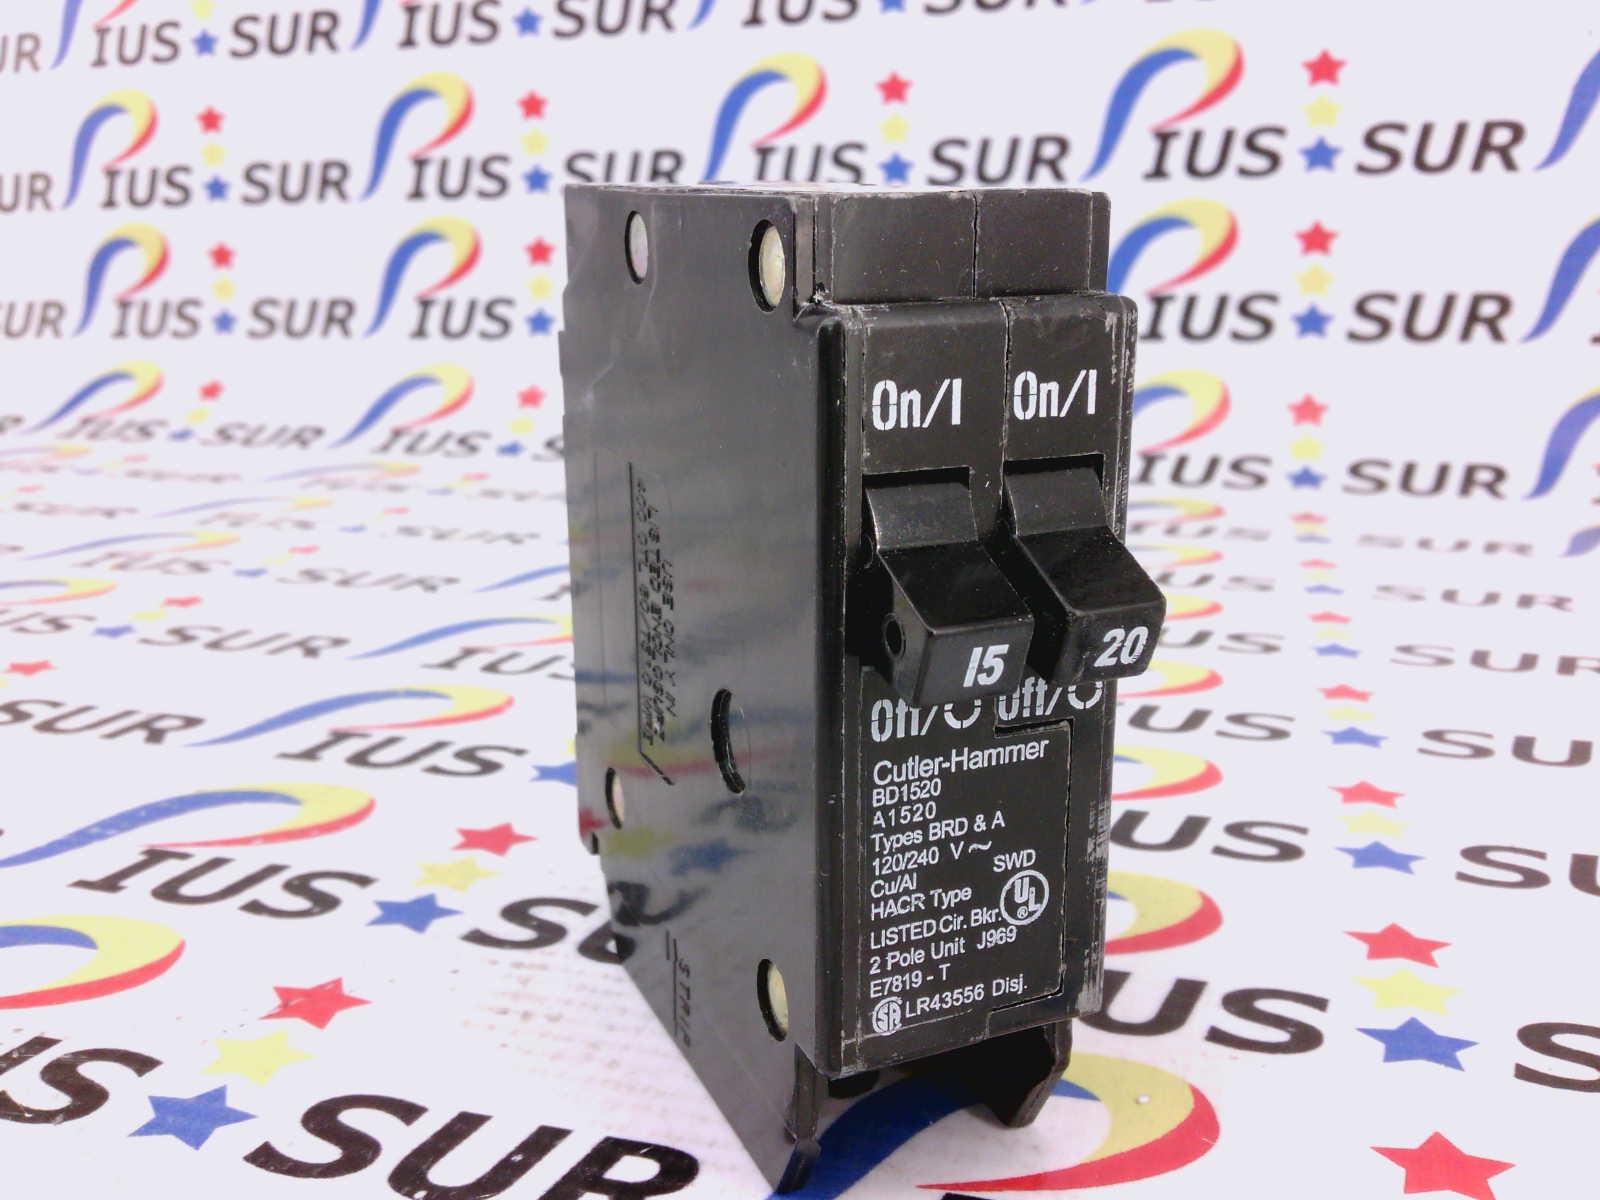 Single Pole Rv Fuse Box Detailed Schematics Diagram Basic Wiring Schematic Parallax Power Supply 3050 15 Distribution Panel Breaker Cutler Hammer